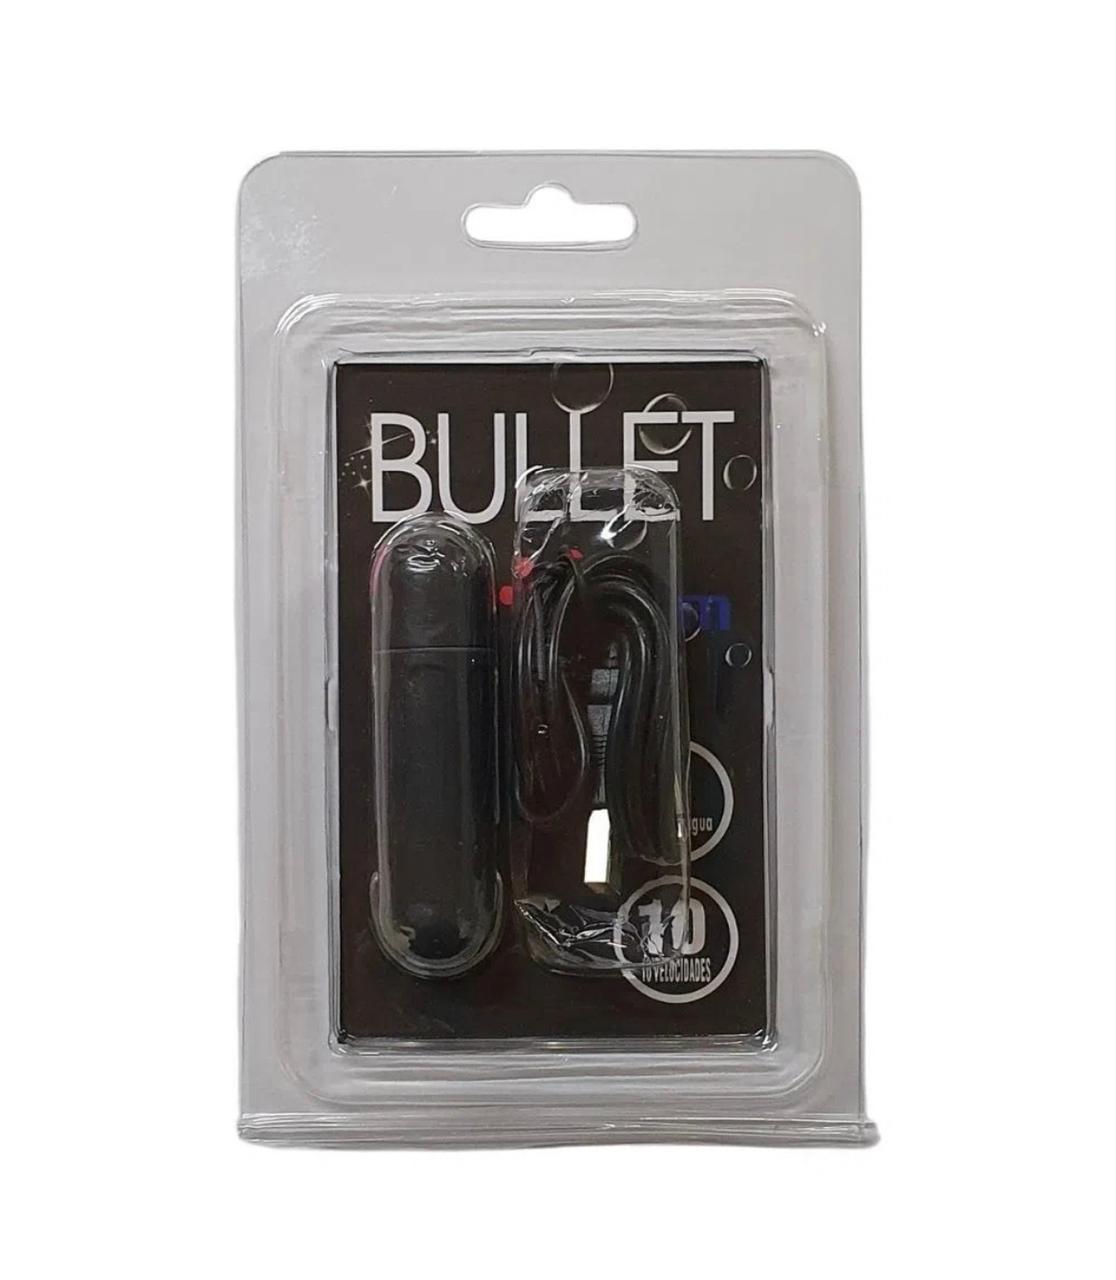 Bullet Vibratório Recarregável Preto - 10 Velocidades